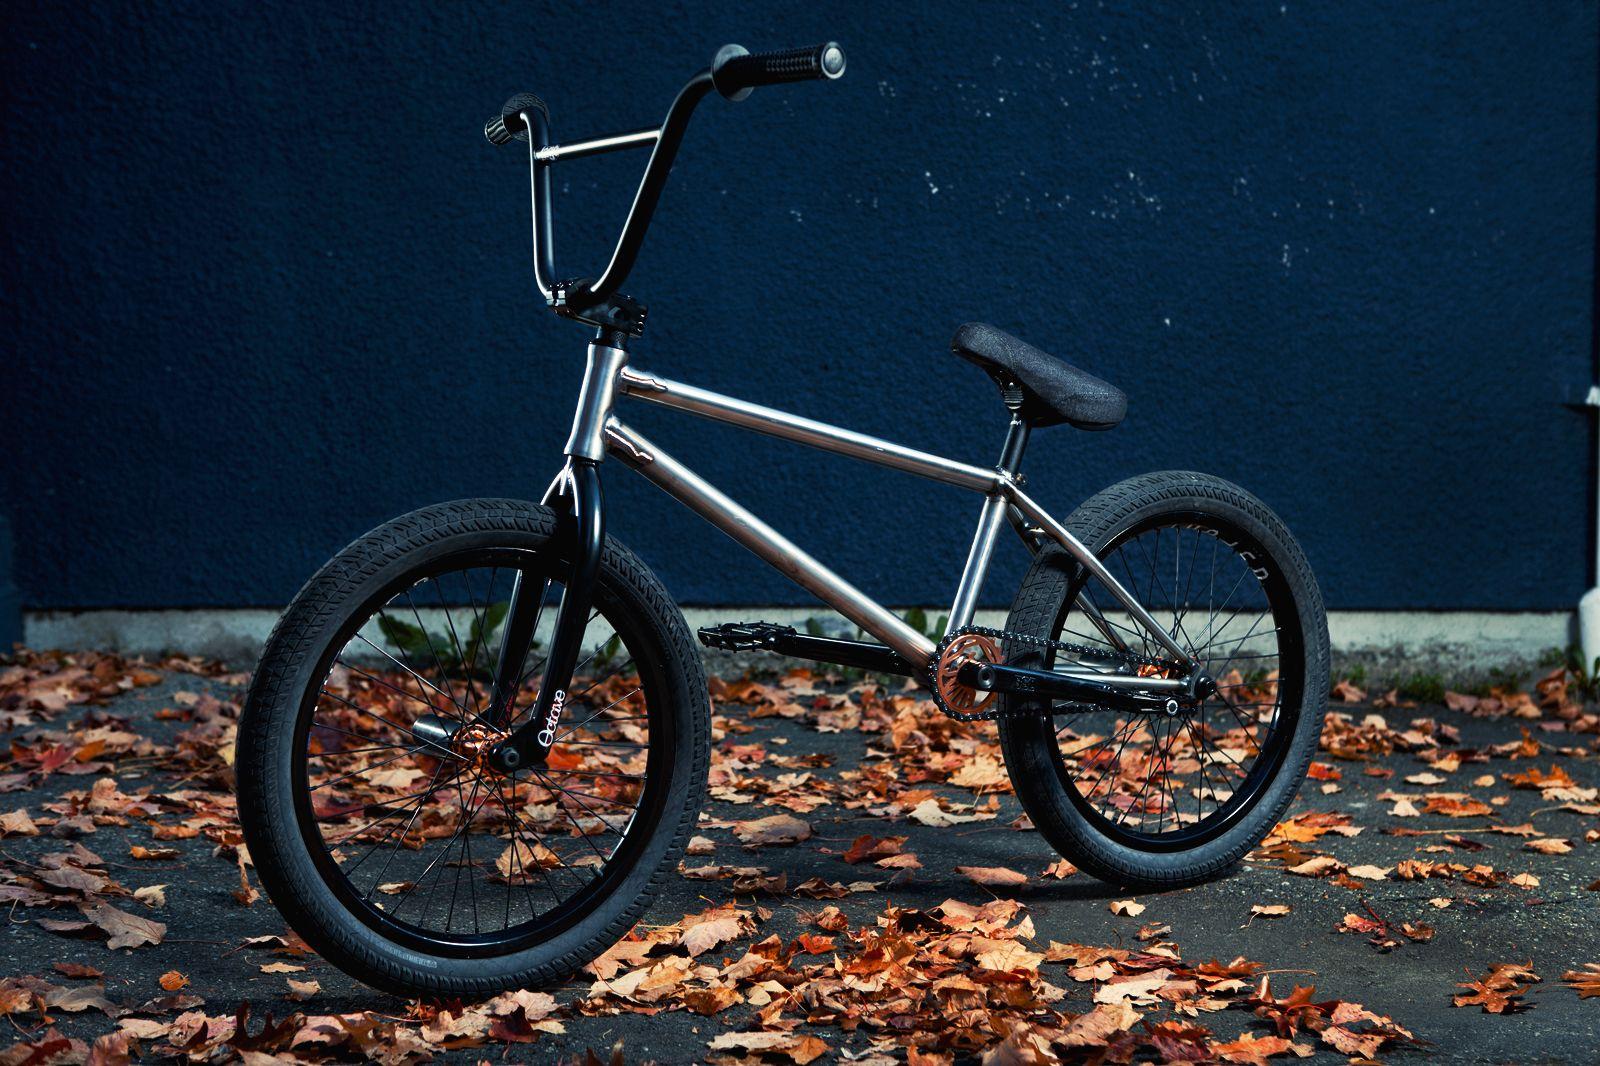 Bmx Street Bikes Pesquisa Google Bmx Bikes Bmx Street Best Bmx